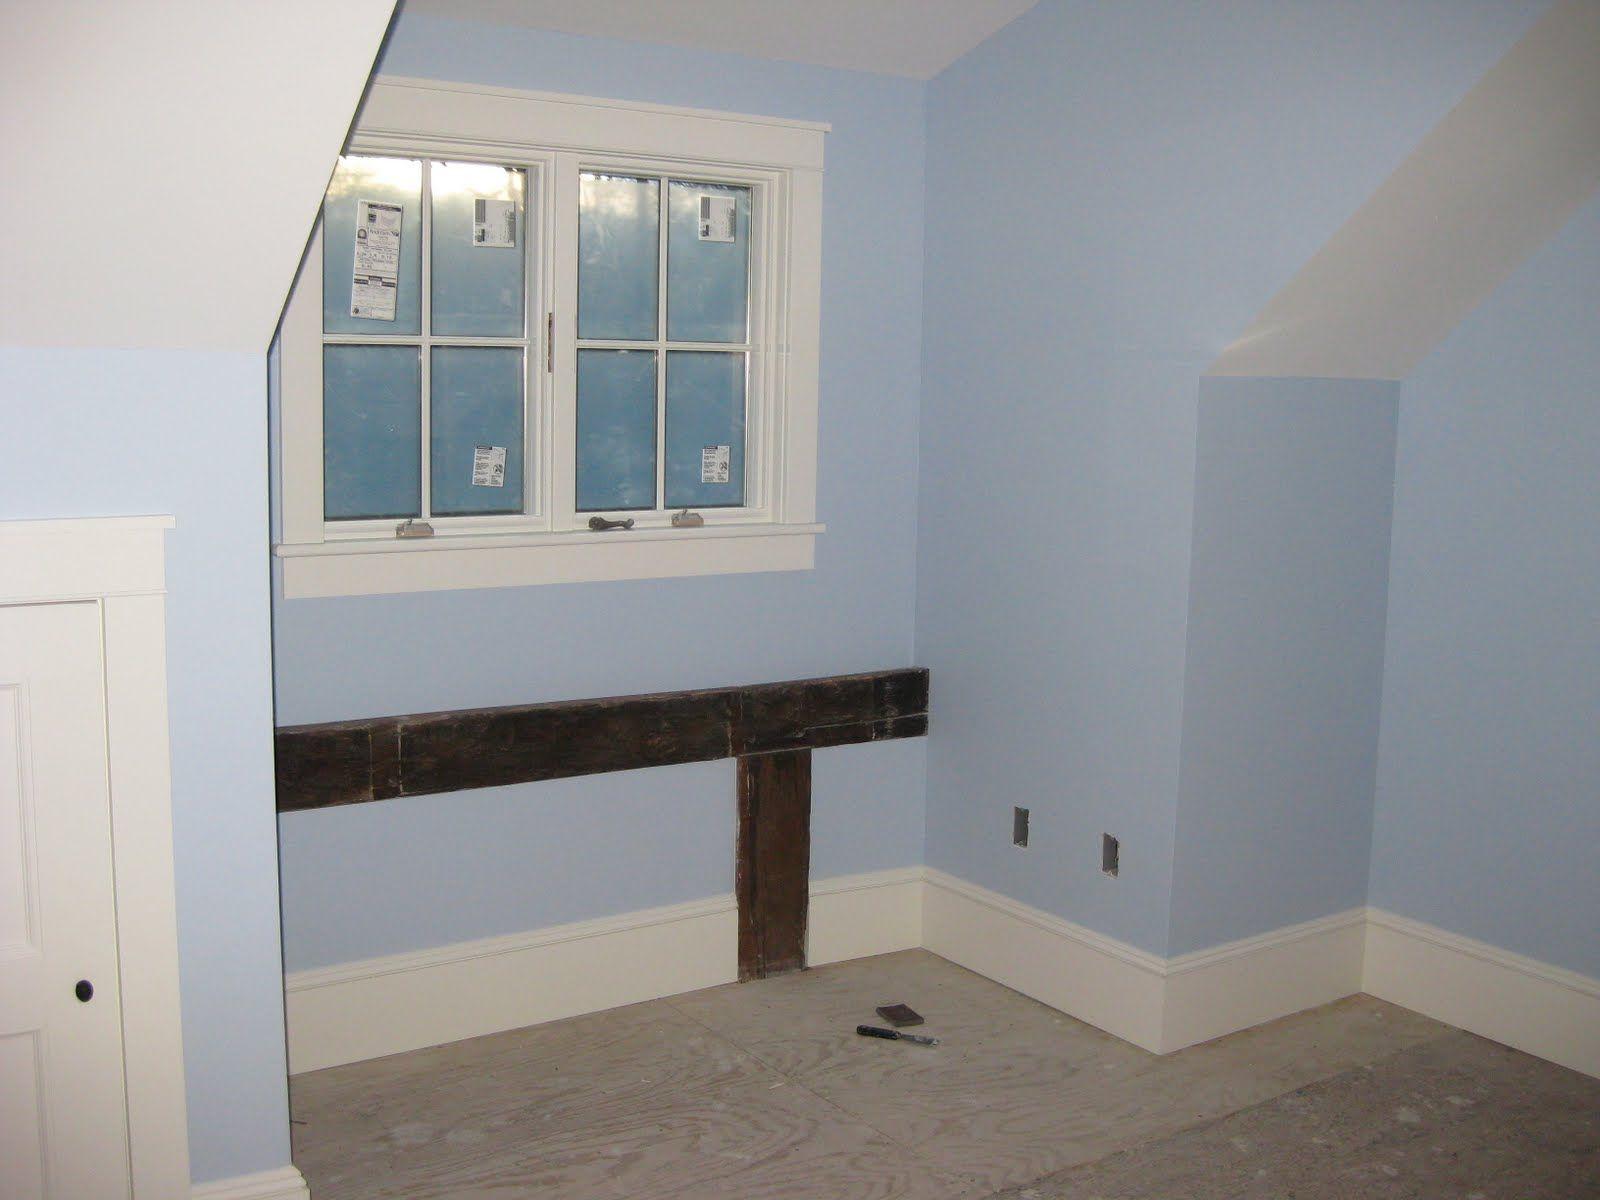 Light blue wall paint colors - Bm Lake Placid Wall Colorspaint Colorsbenjamin Moorehard Tothe Whitelight Bluelakes